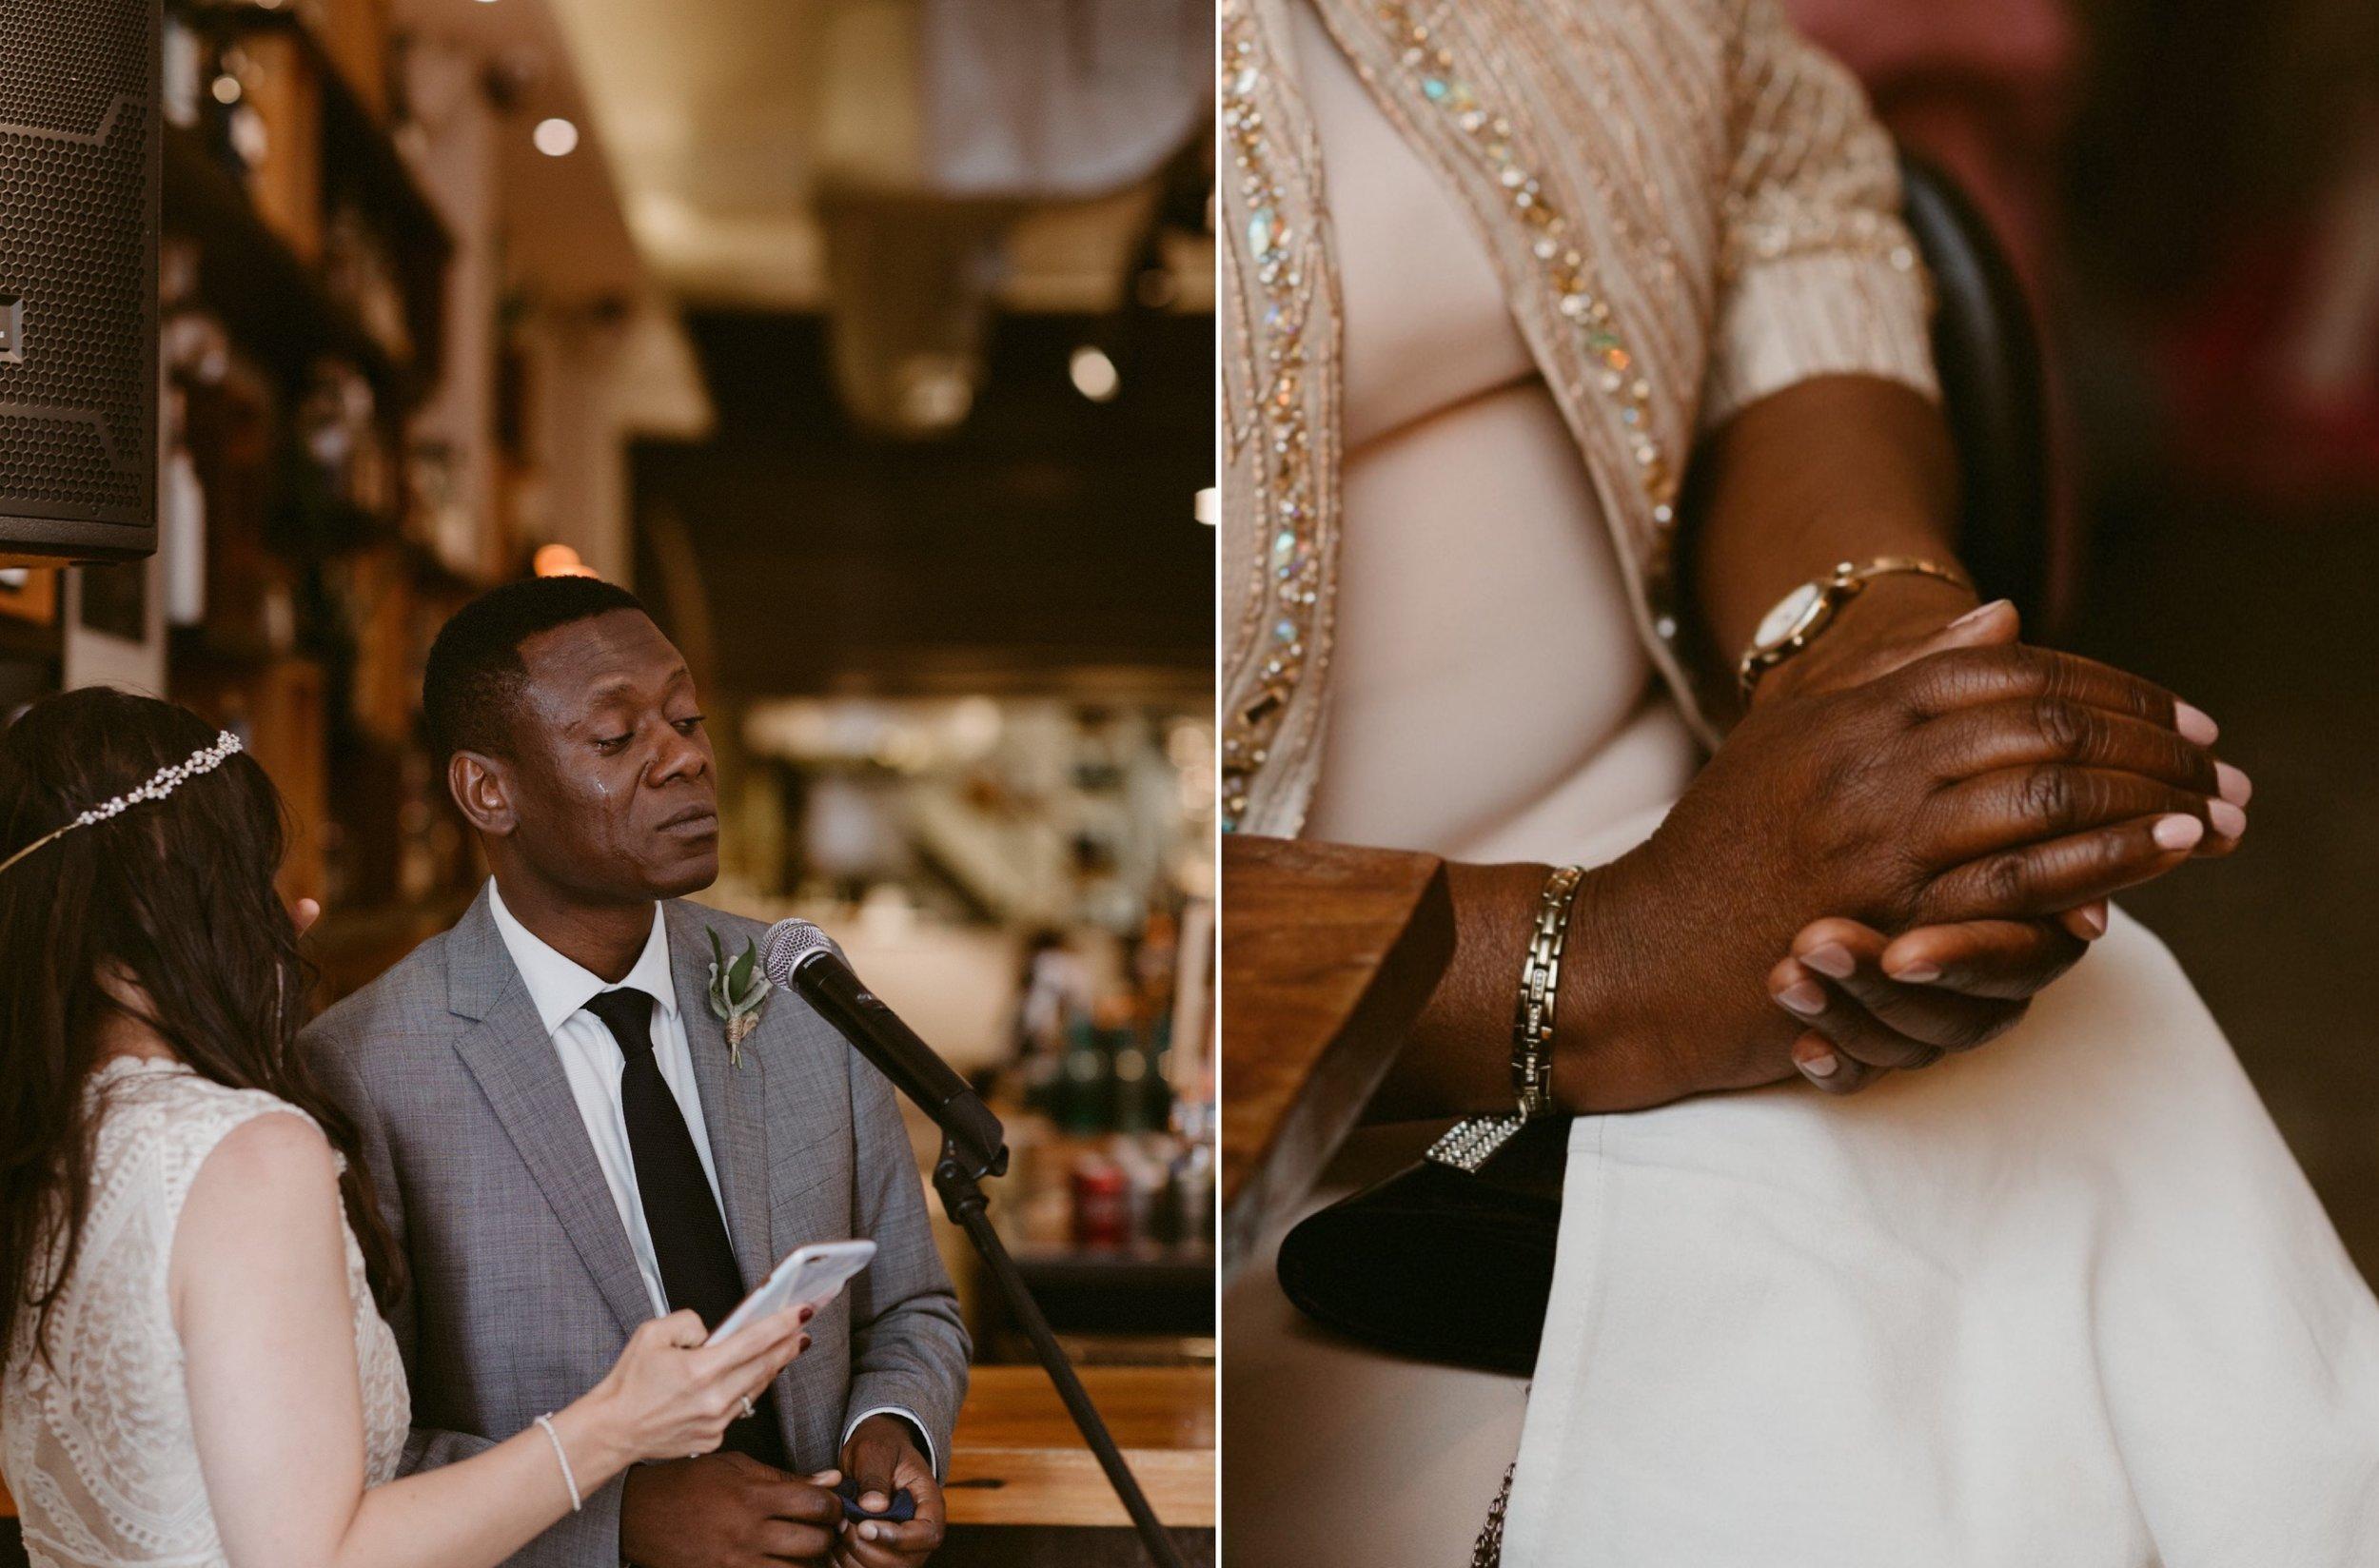 113_Spadina House Wedding (656 of 748)_Spadina House Wedding (650 of 748)_Wedding_Boehmer_Restaurant_Toronto_intimate.jpg